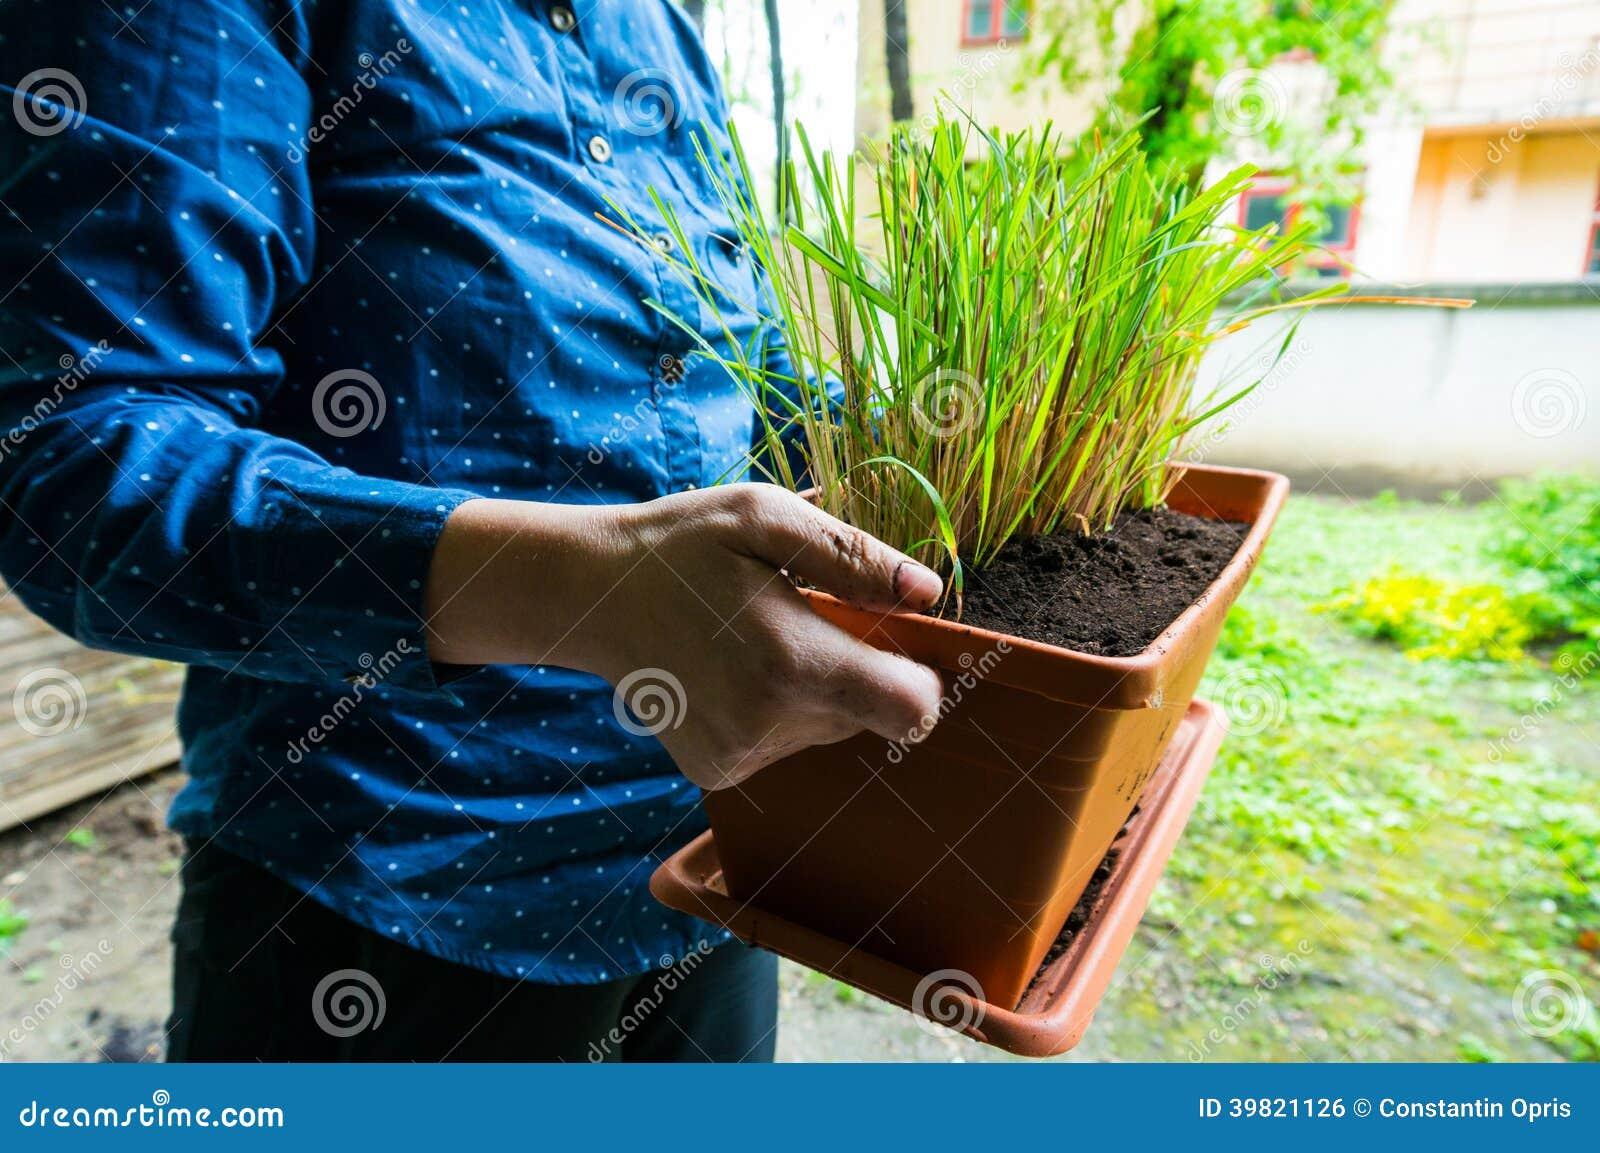 Lemongrass in flowerpot